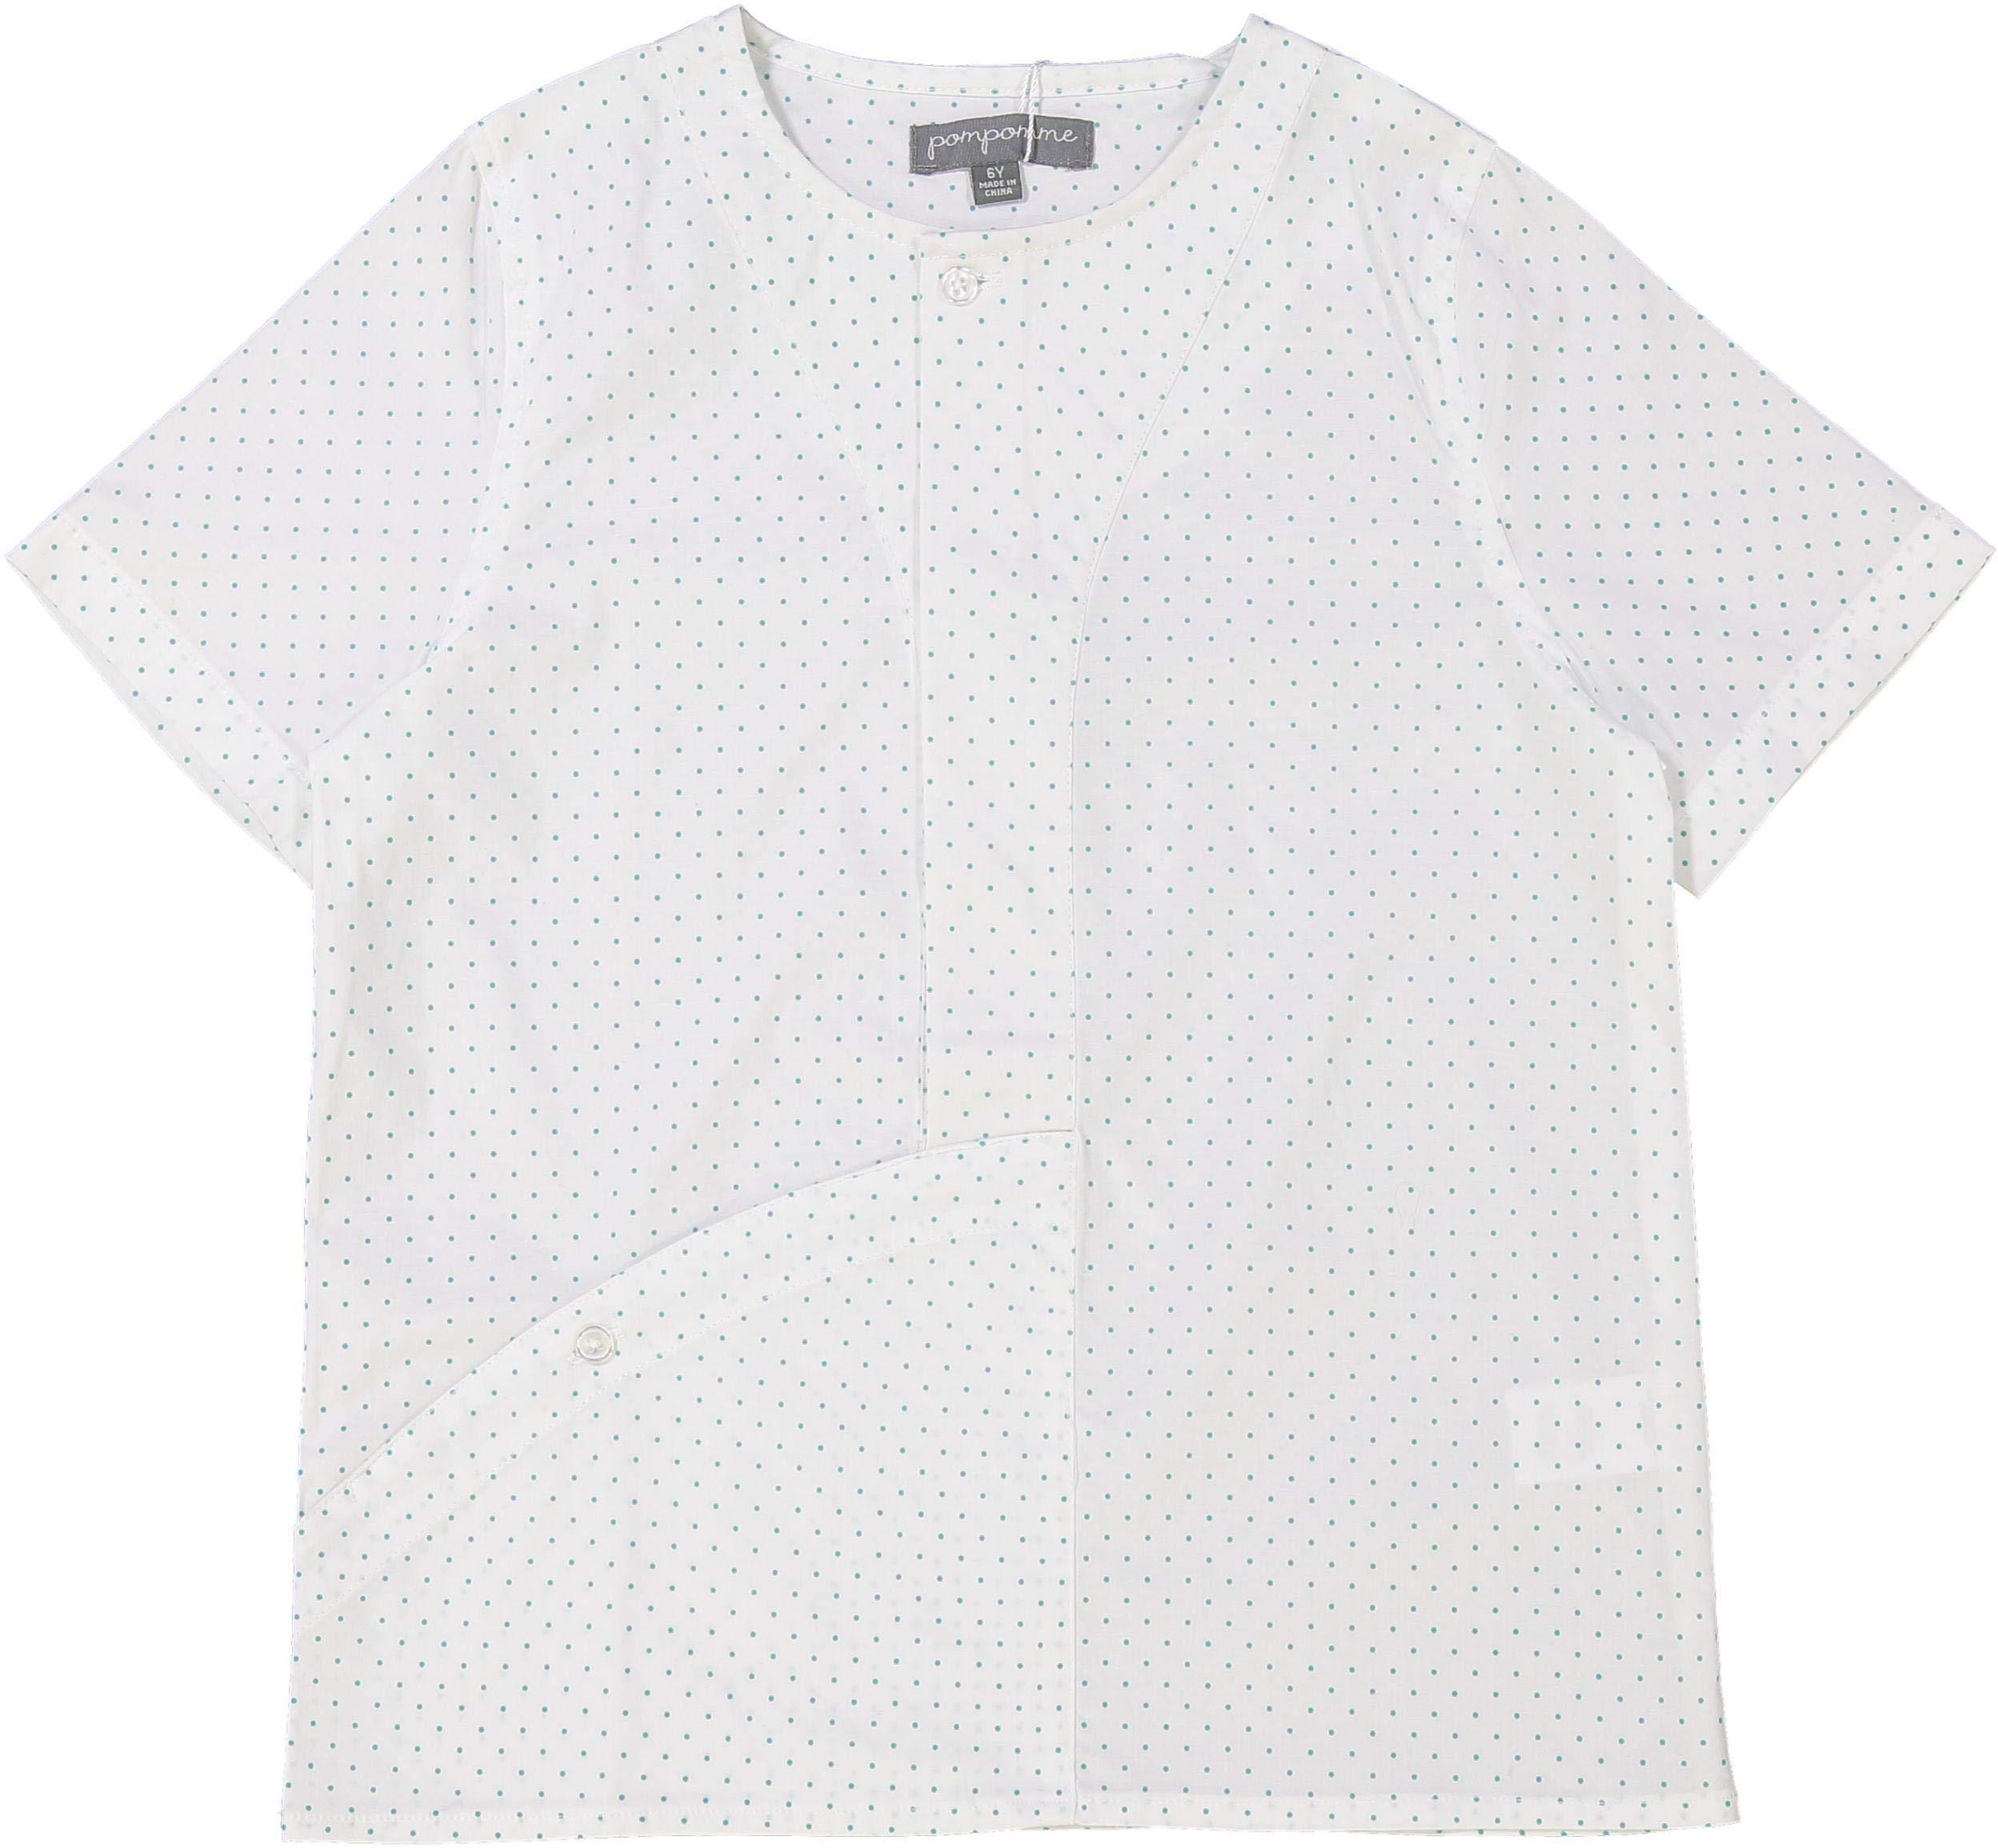 Pompomme Boys Short Sleeve Dress Shirt with No Collar - 7304EM - Emerald, 18 Months